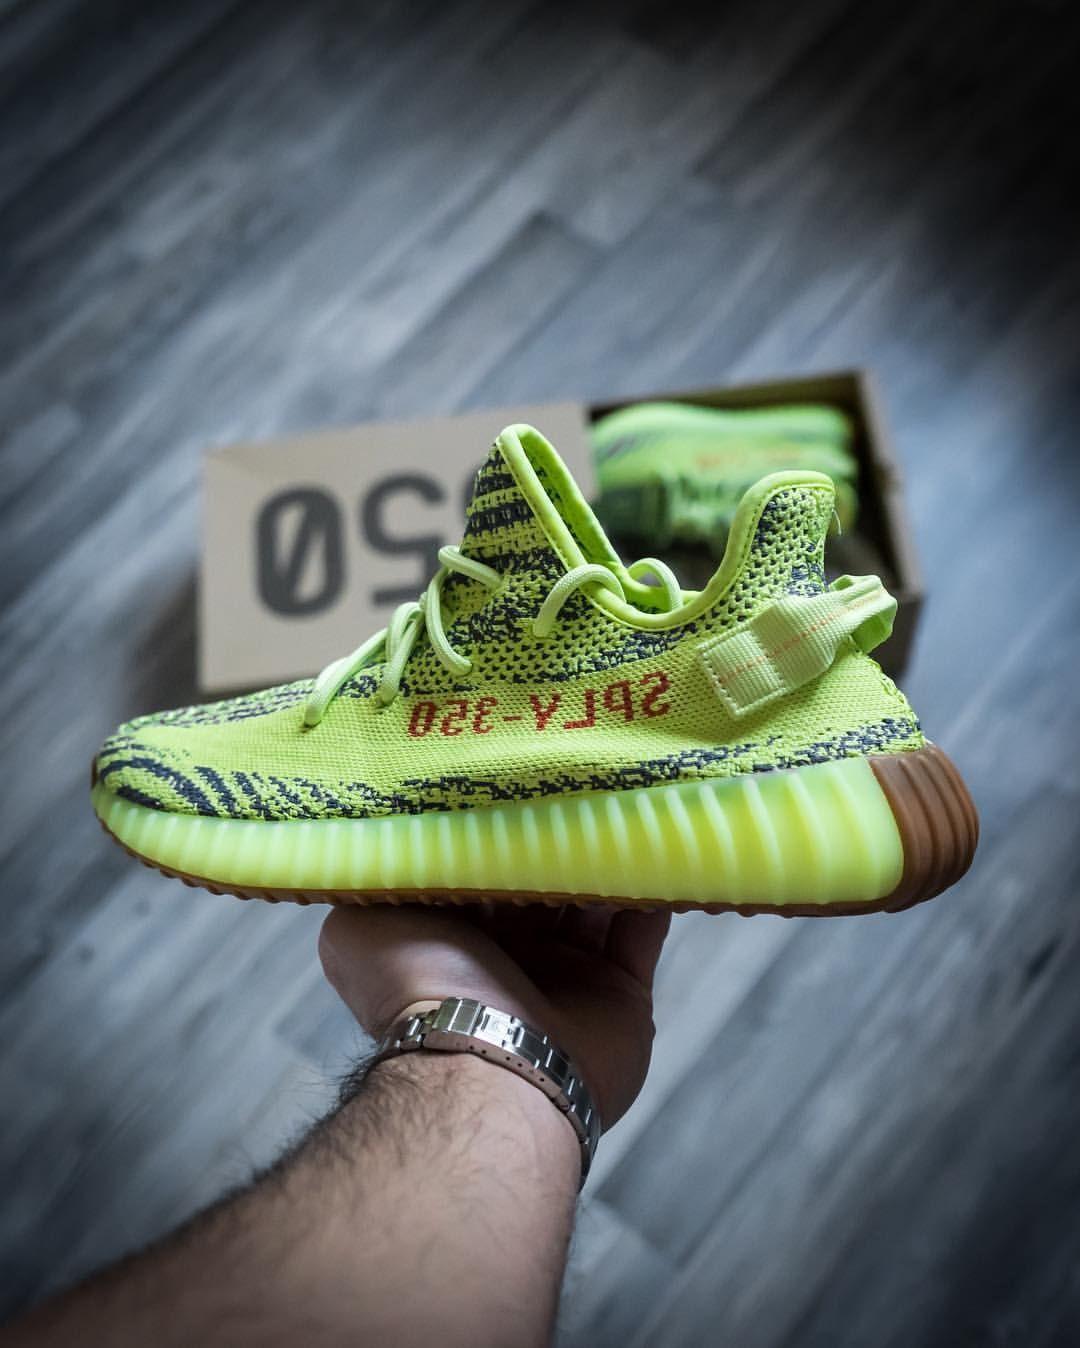 Adidas Yeezy Boost 350 V2: semi - frozen AMARILLO zapatos Converse